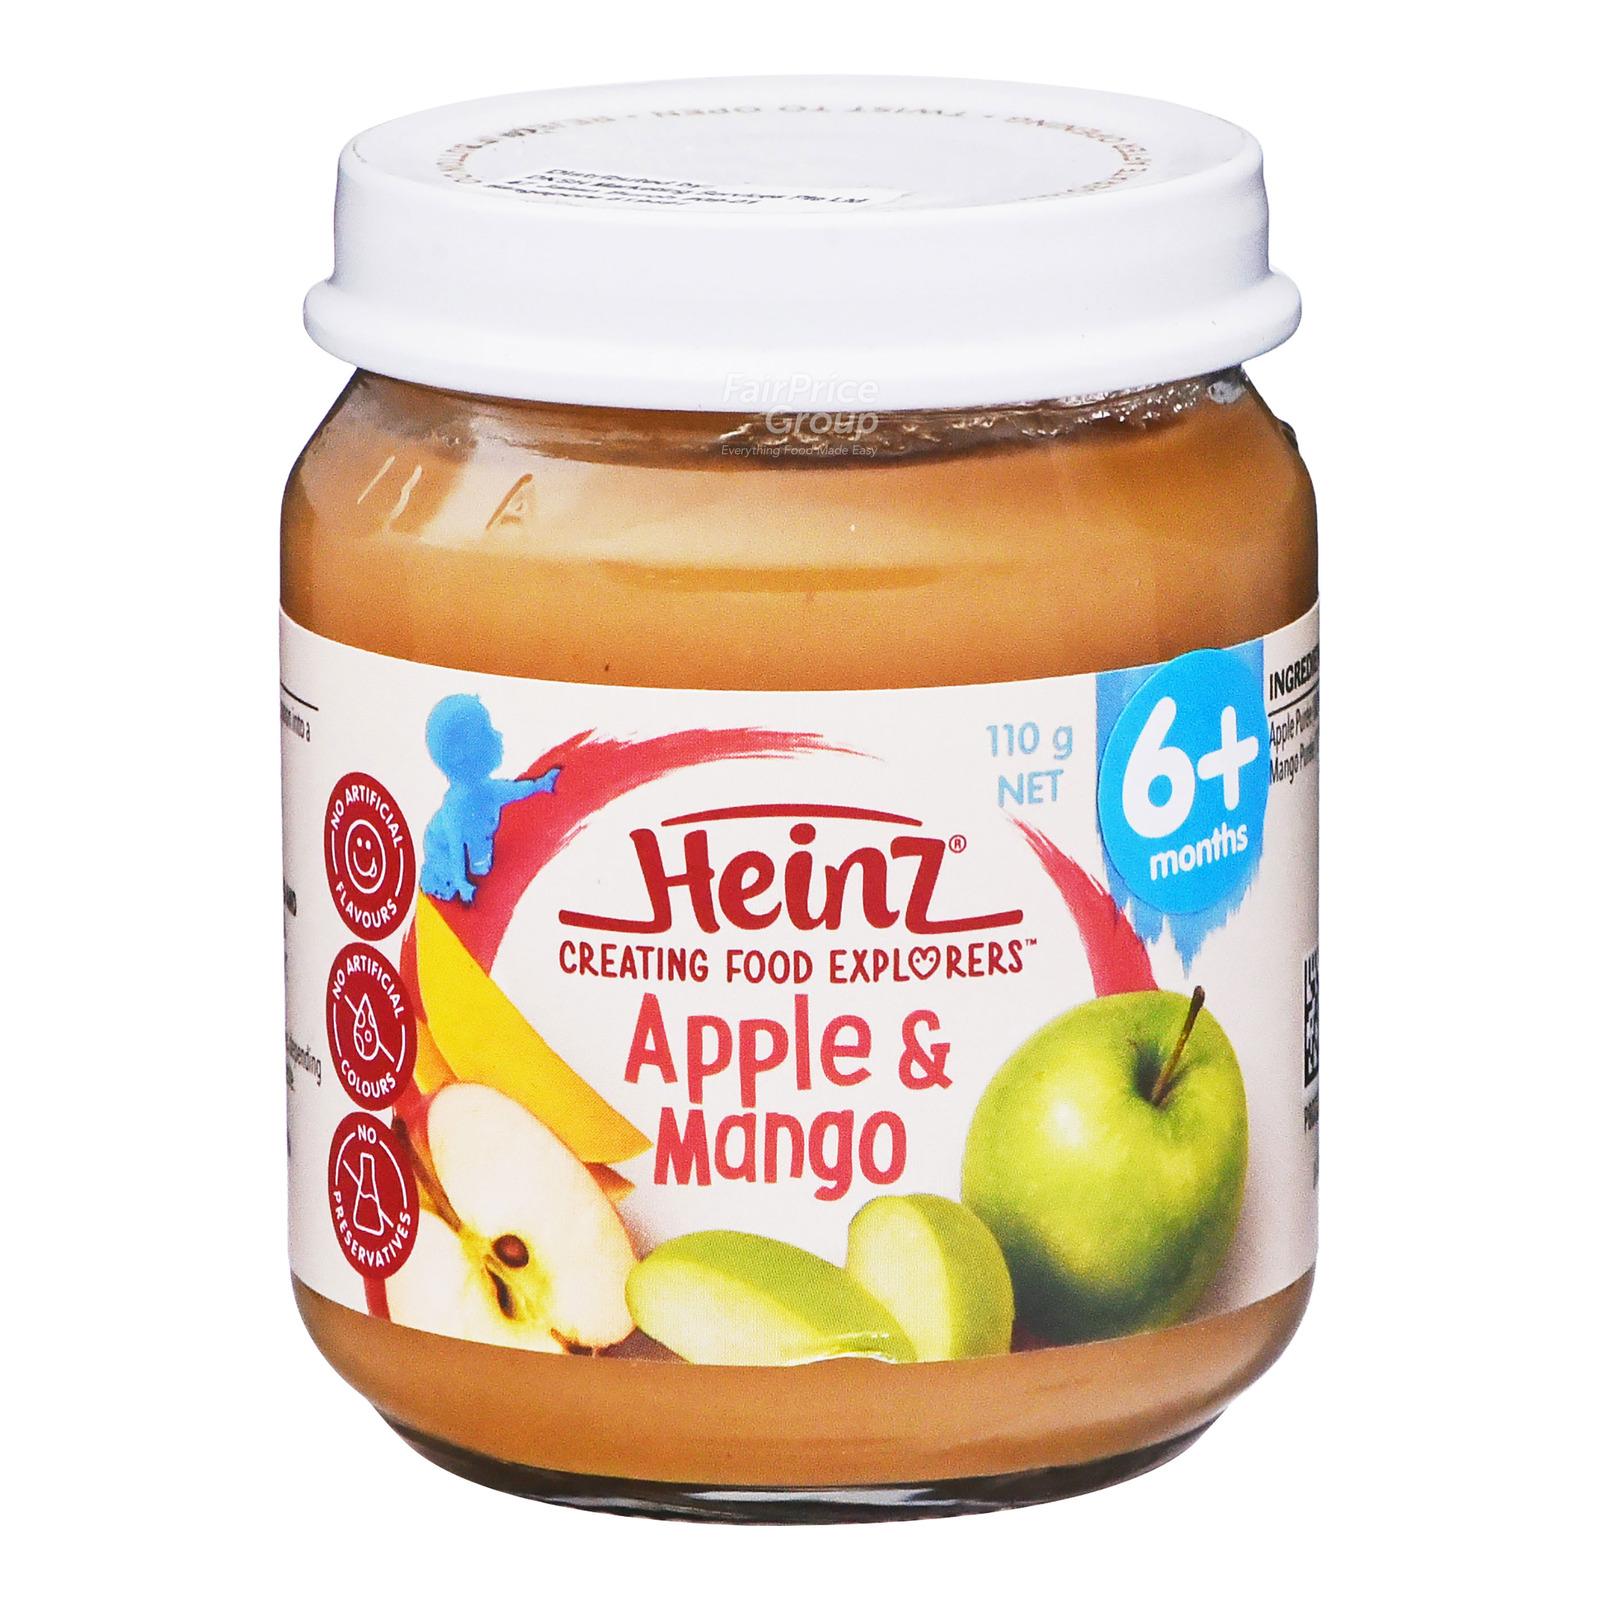 Heinz Baby Food - Apple & Mango (6+ Months)